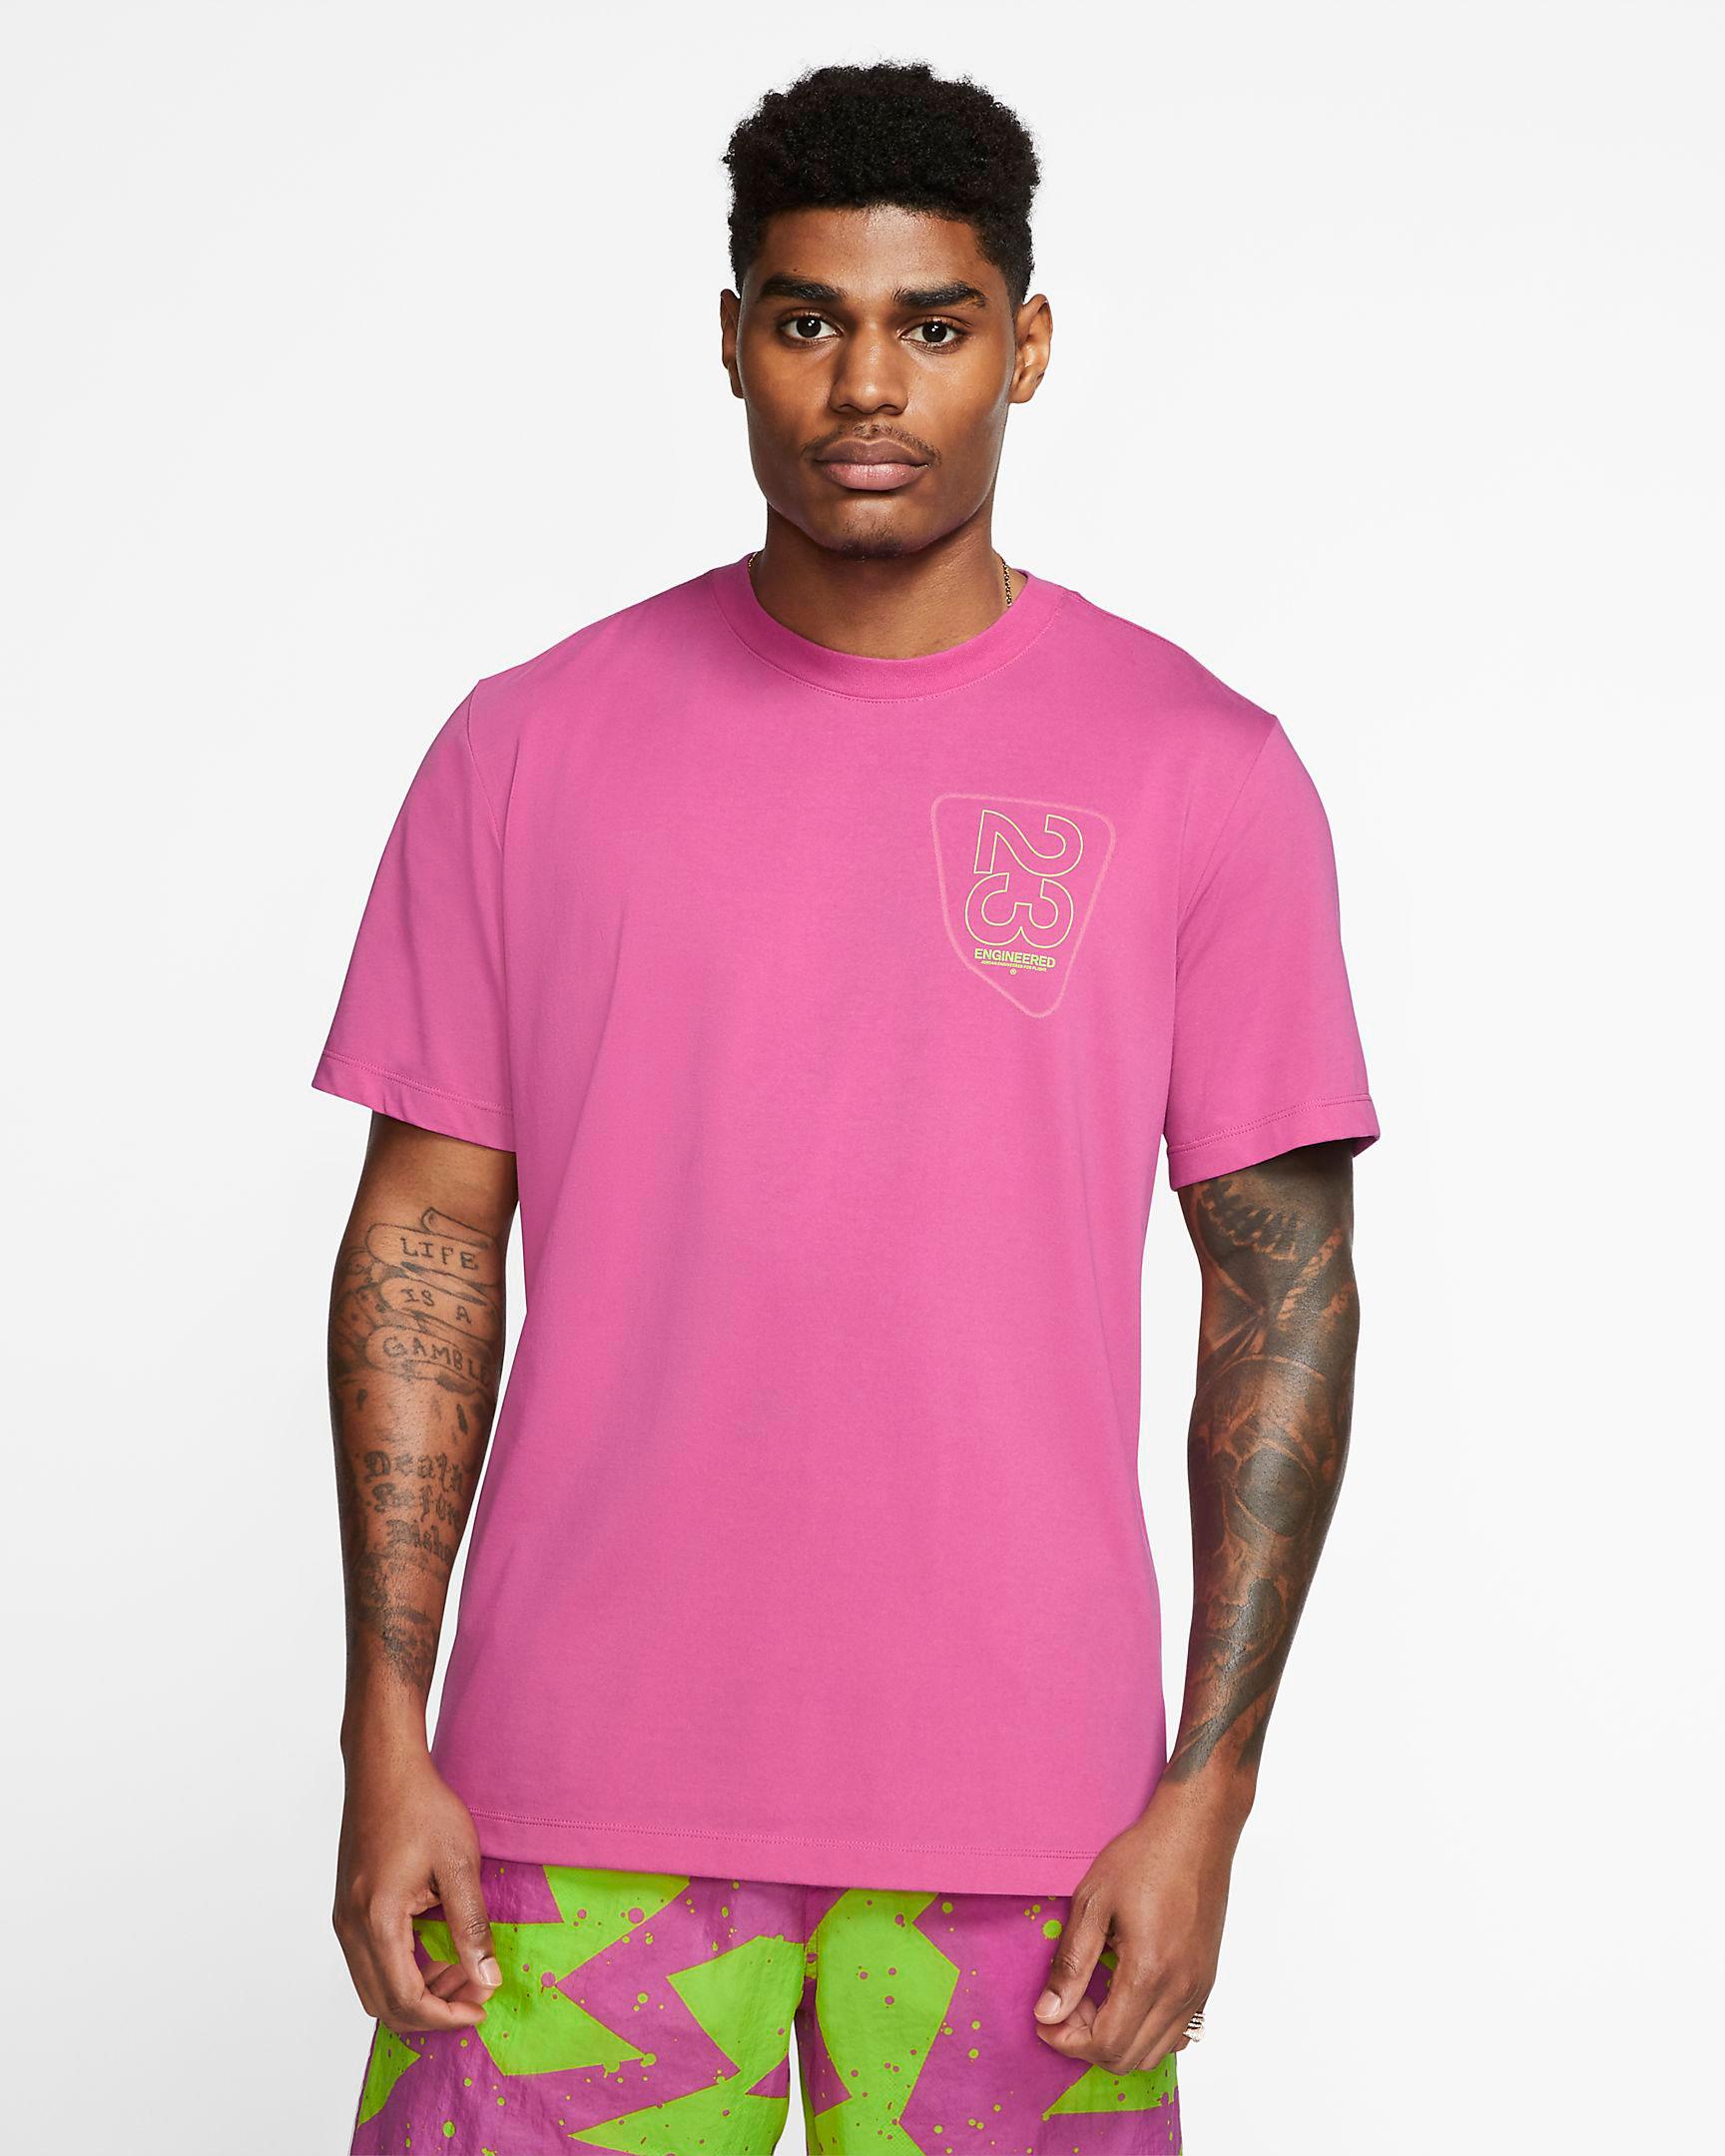 jordan-5-bel-air-2020-pink-shirt-match-1